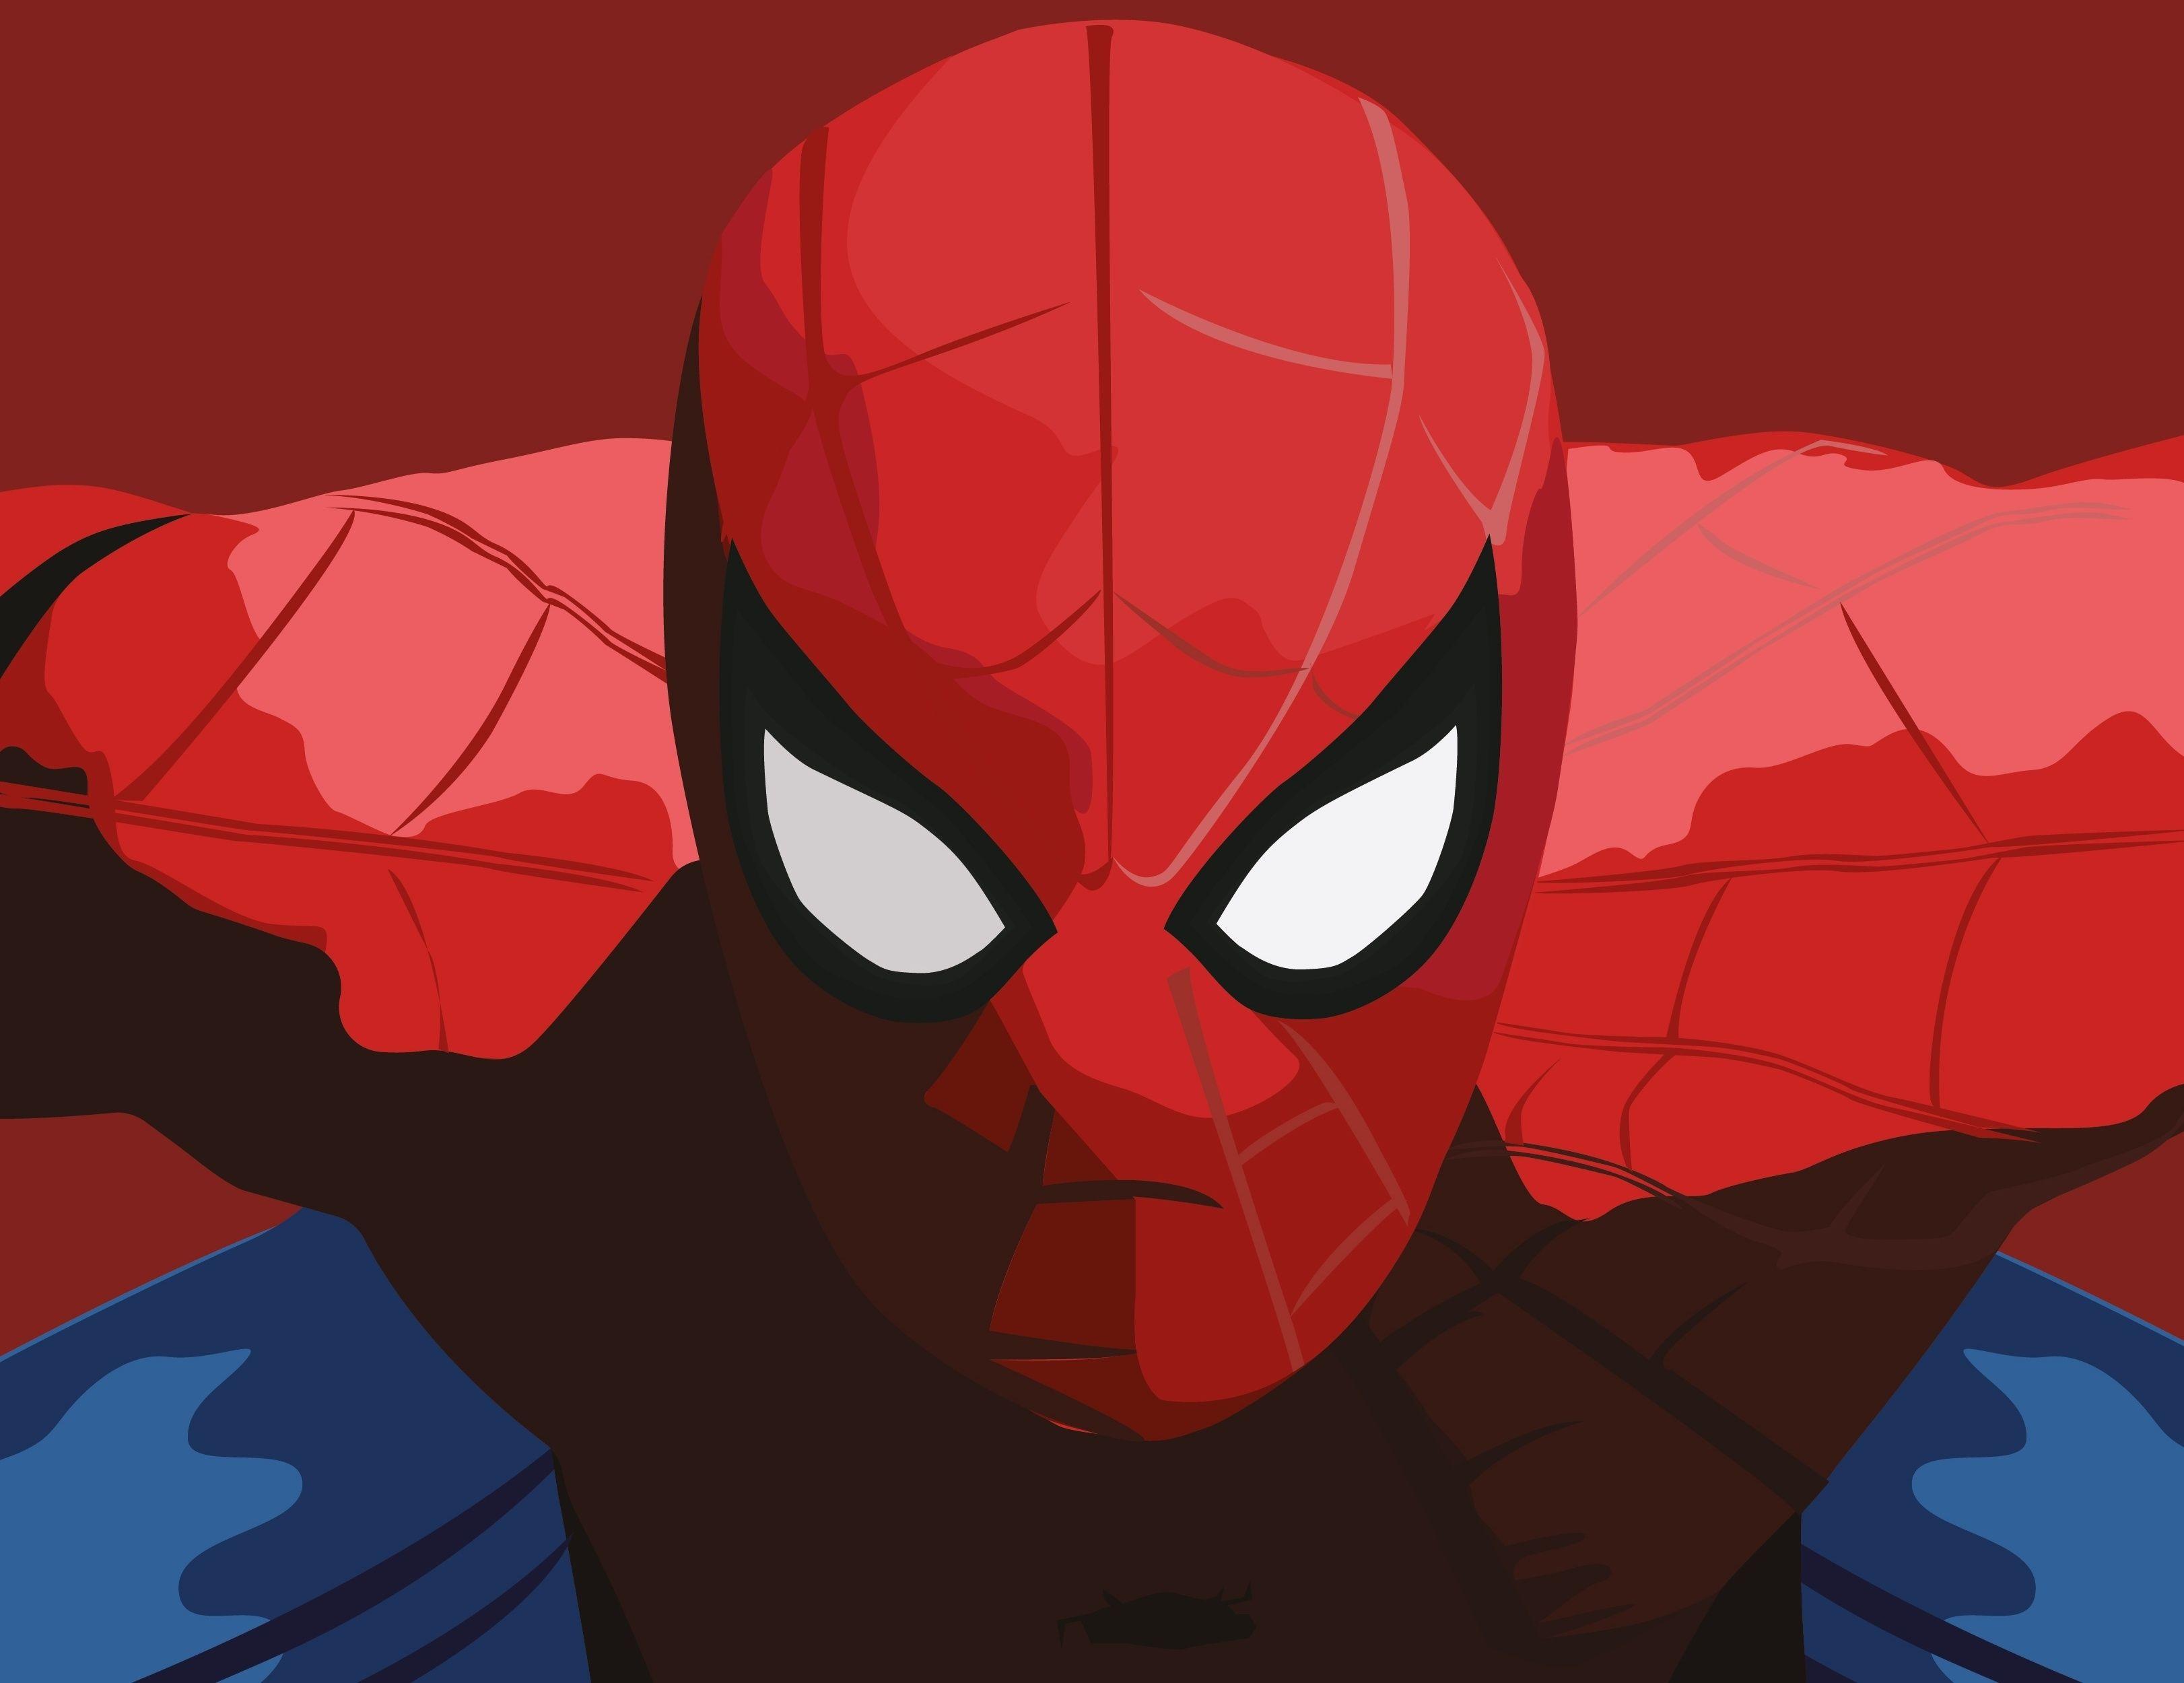 Downaload Spider Man Minimal Close Up Art Wallpaper 3244x2500 Spiderman Amazing Spiderman Marvel Images